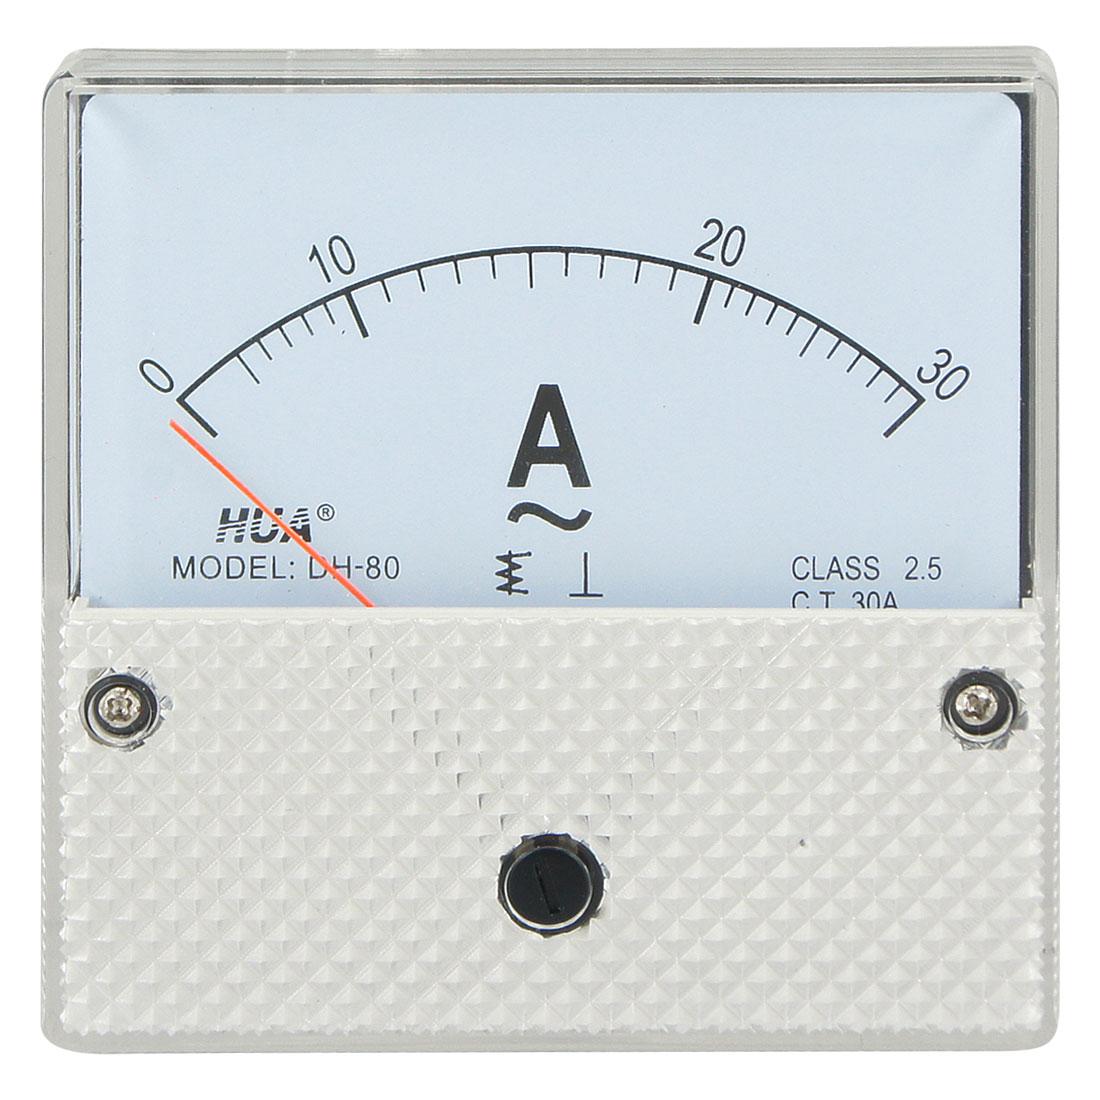 Square Shape Class 2.5 DH80 AC 0-30A Rectangle Analog Panel Ammeter Gauge